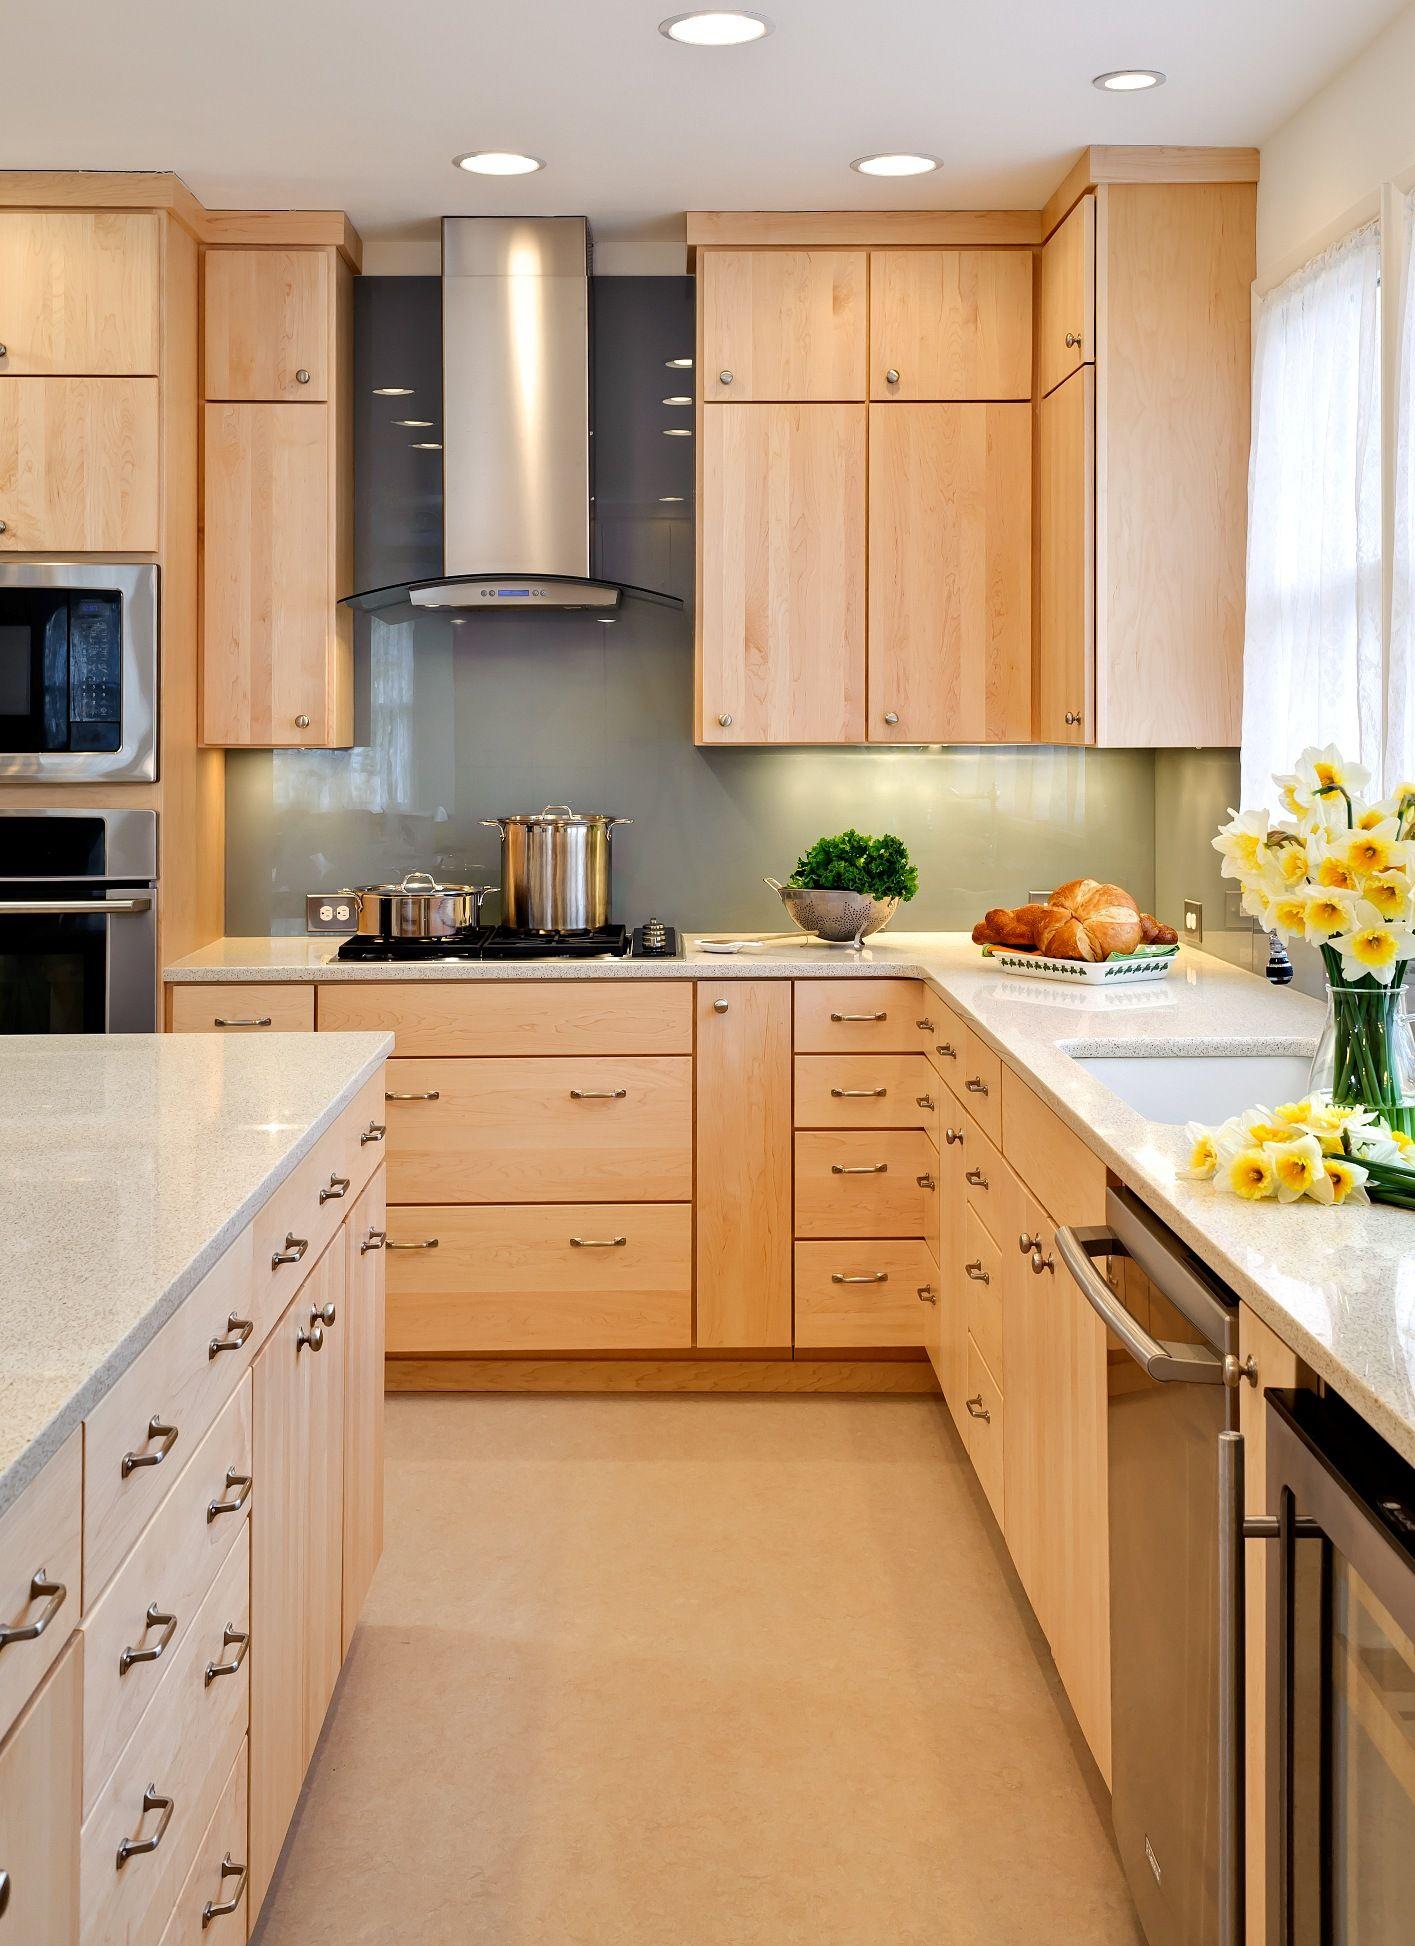 wood kitchen cabinets Kitchen cabinets